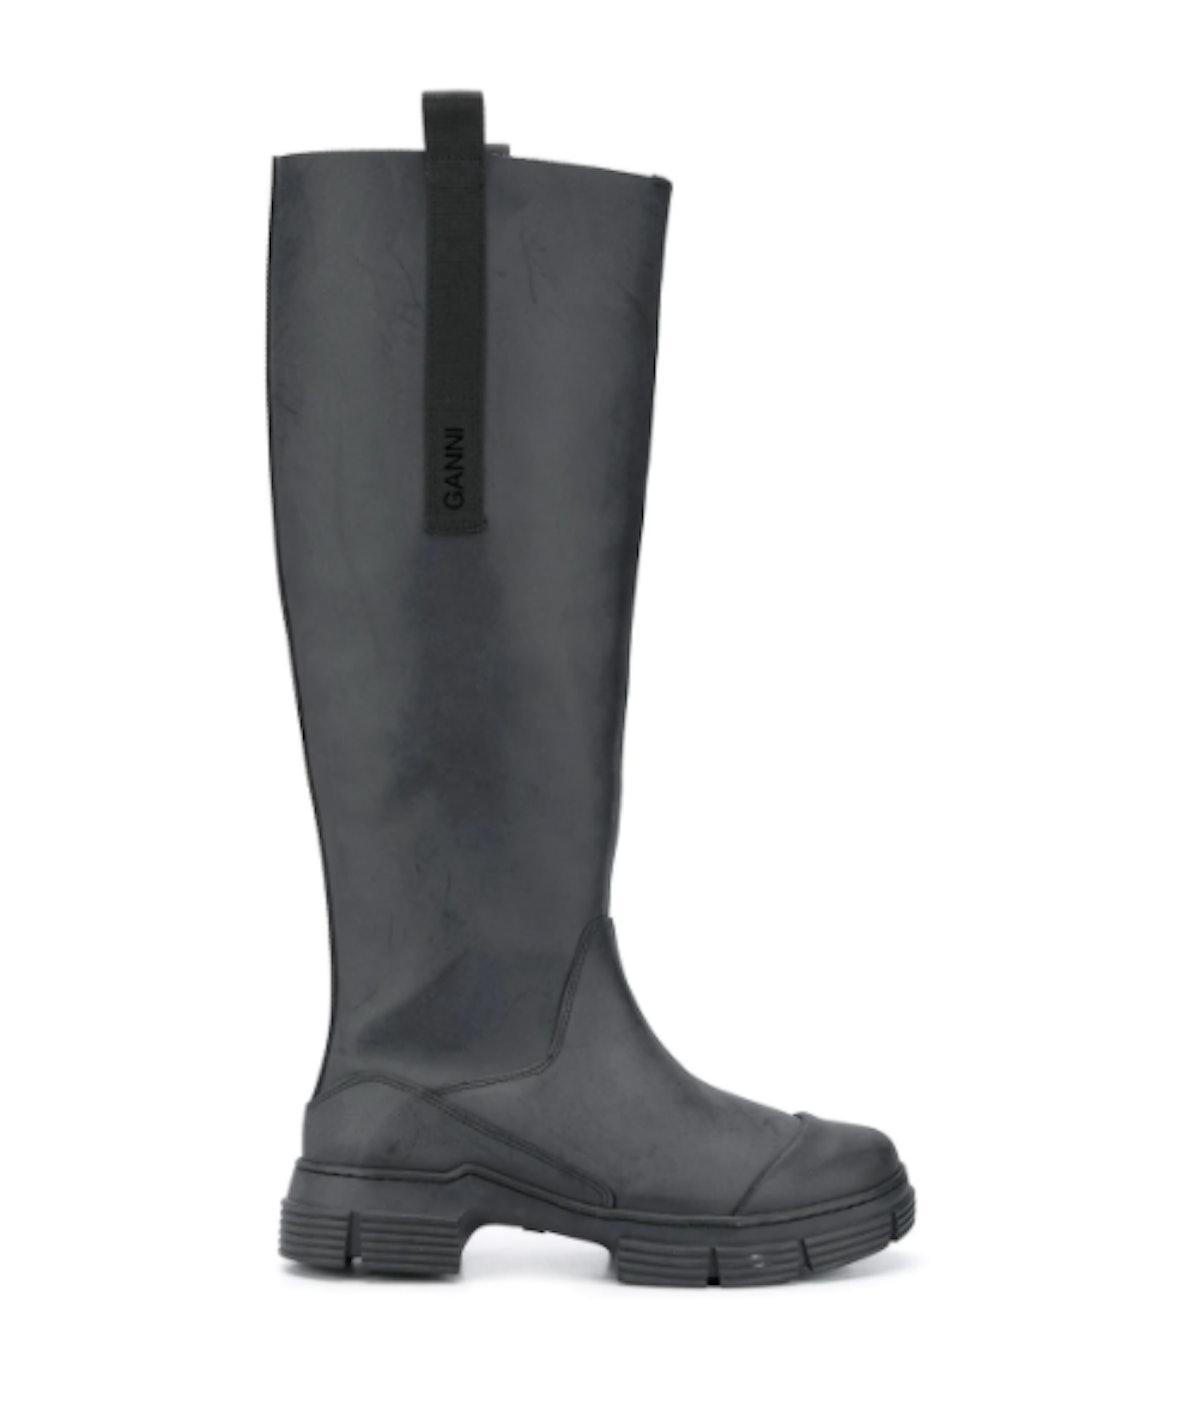 Rubber Calf-Length Boots